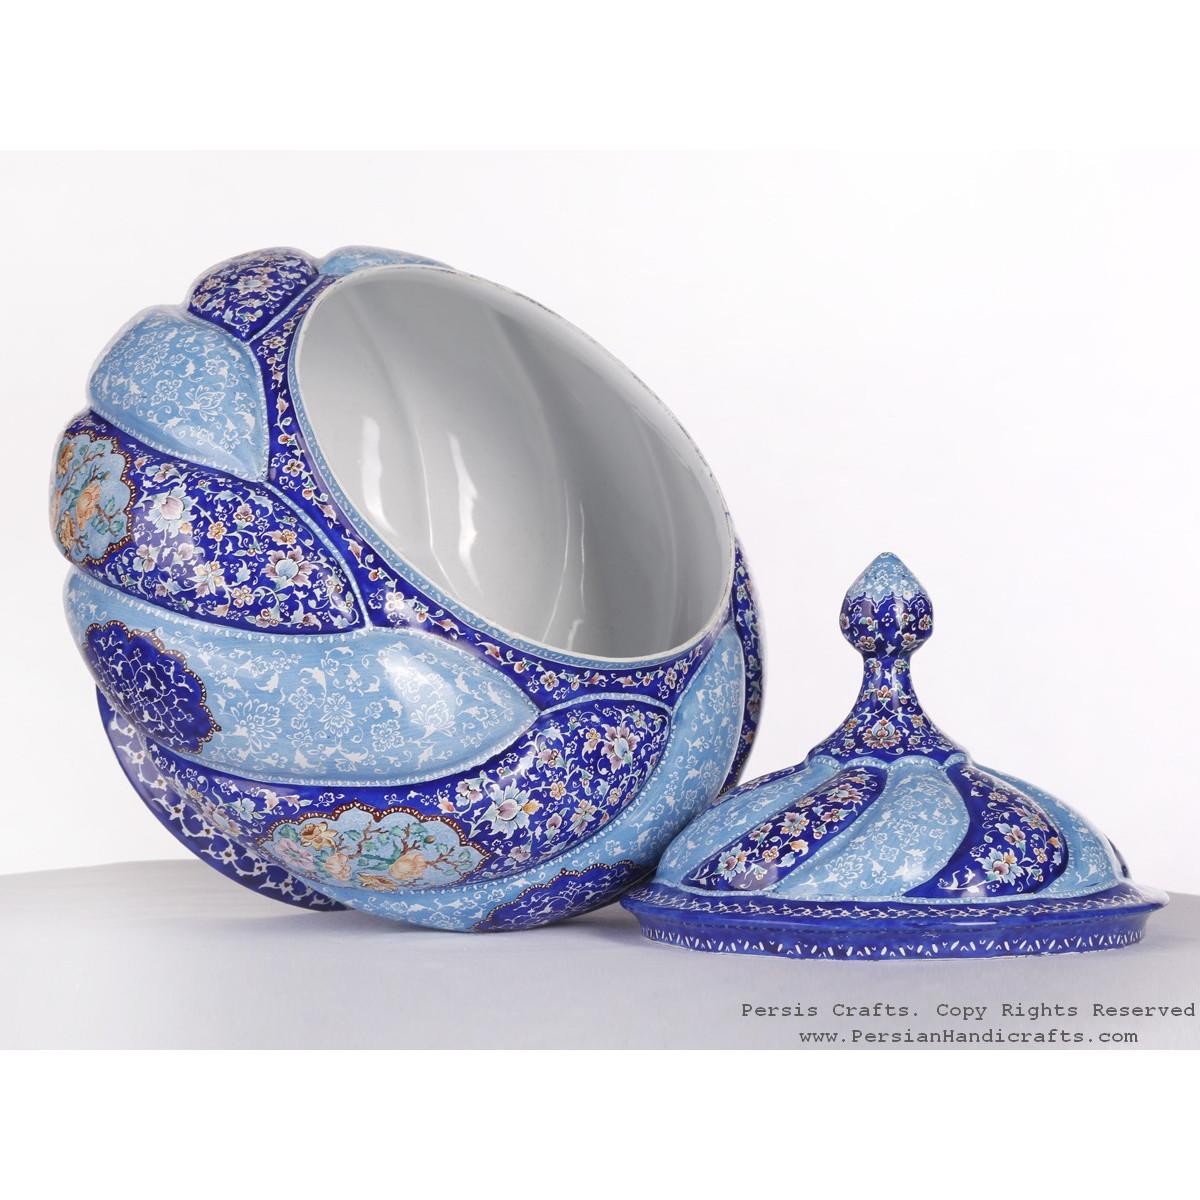 Premium Quality Enamel Minakari Large Candy Pot - HE3613-Persian Handicrafts